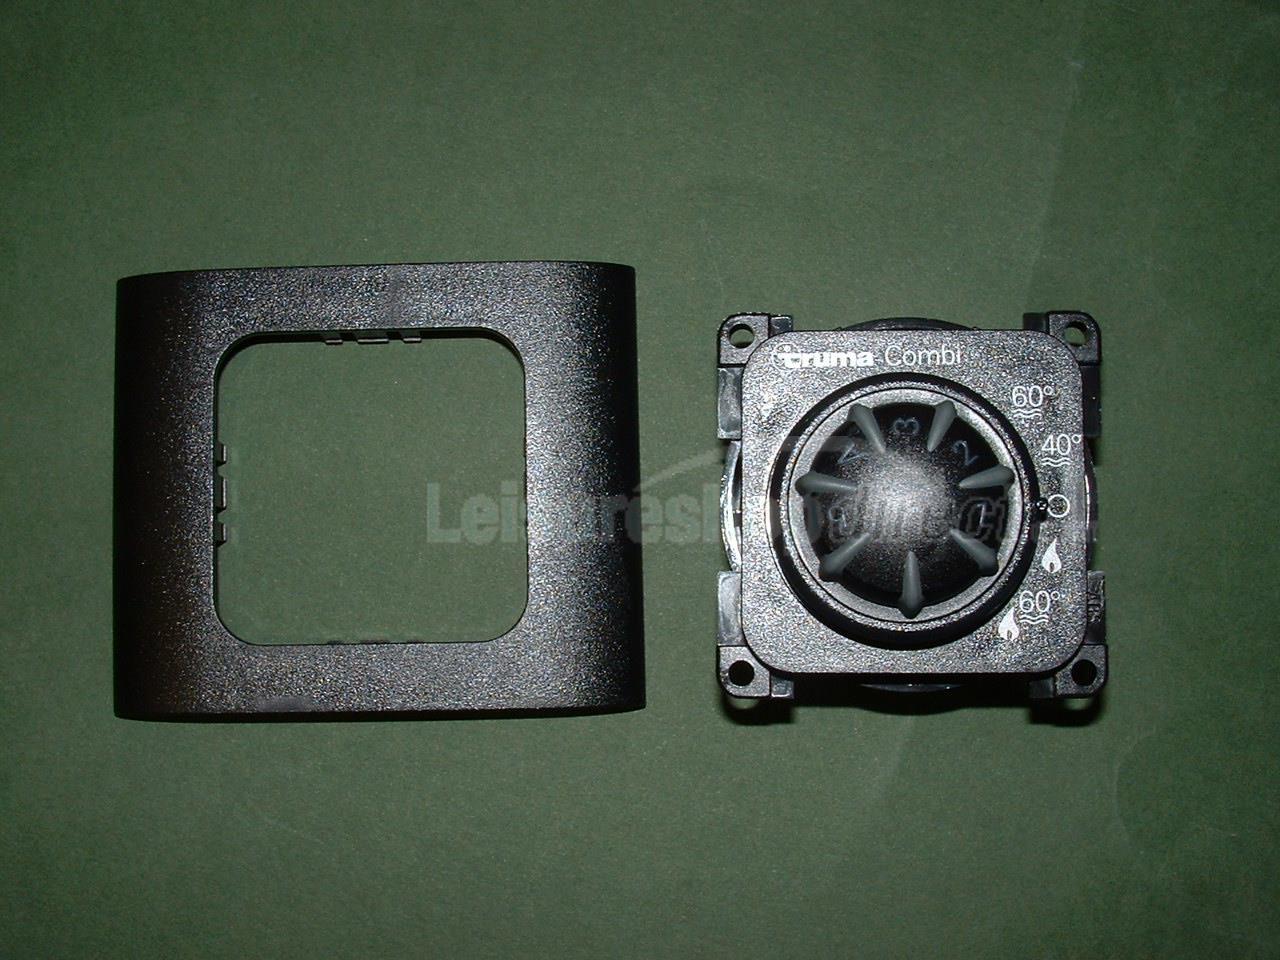 Truma Combi Control Panel 36010 01 Now 36011 Heaters Caravan Heater Wiring Diagram Image 1